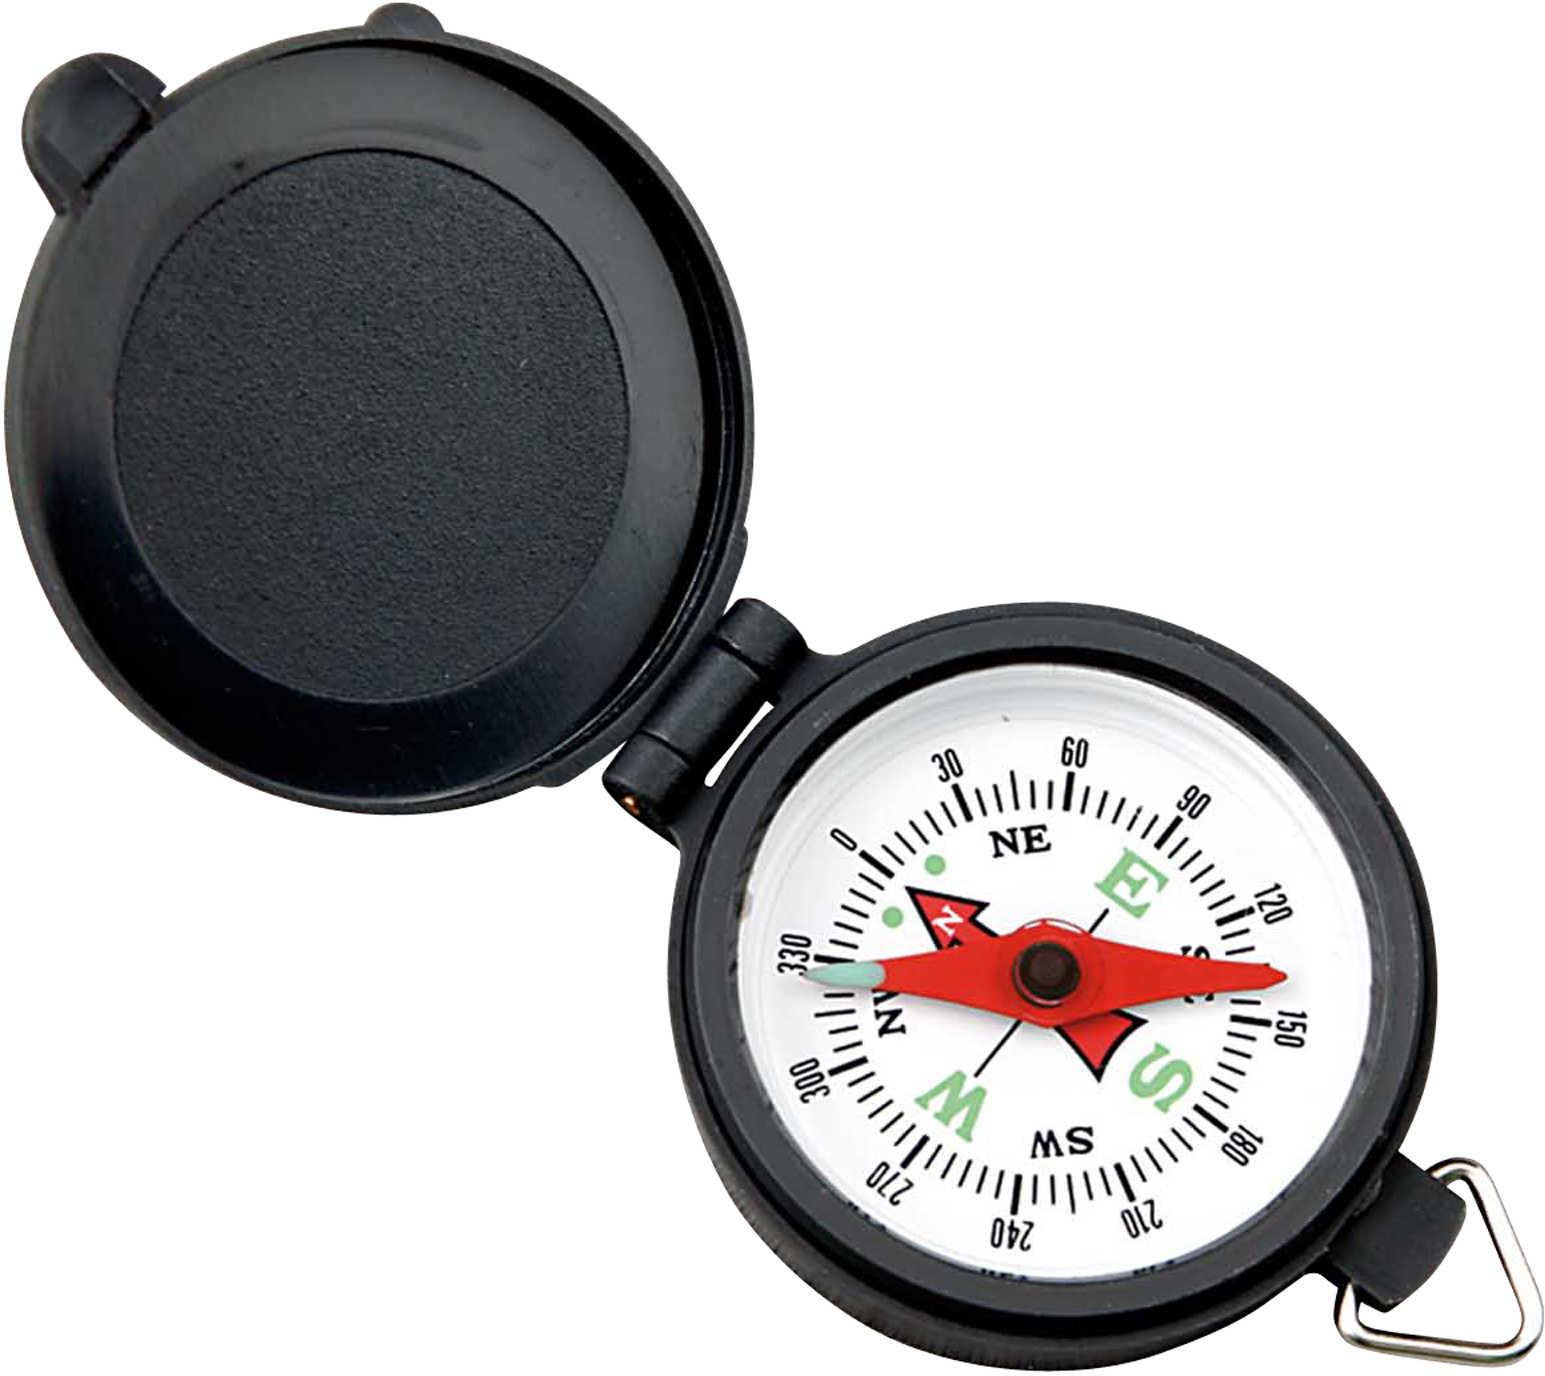 Coleman Compass Pocket w/Plastic Case Md: 2000016512